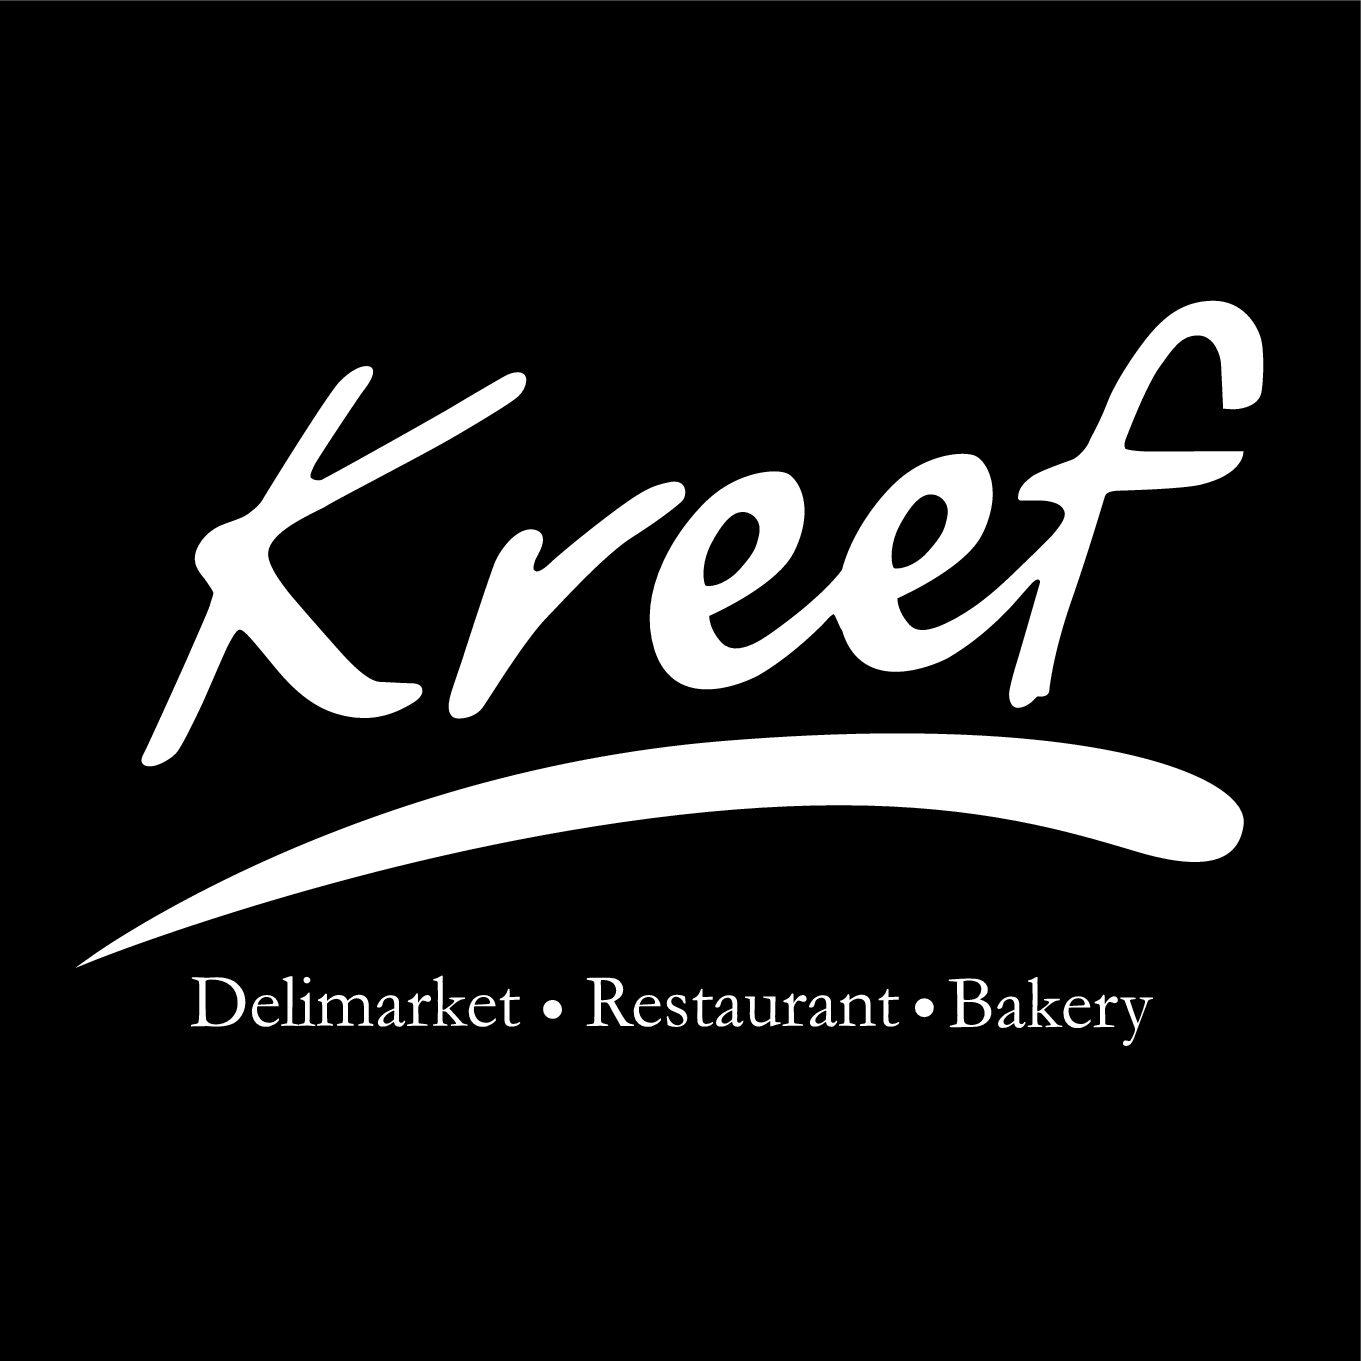 logo kreef